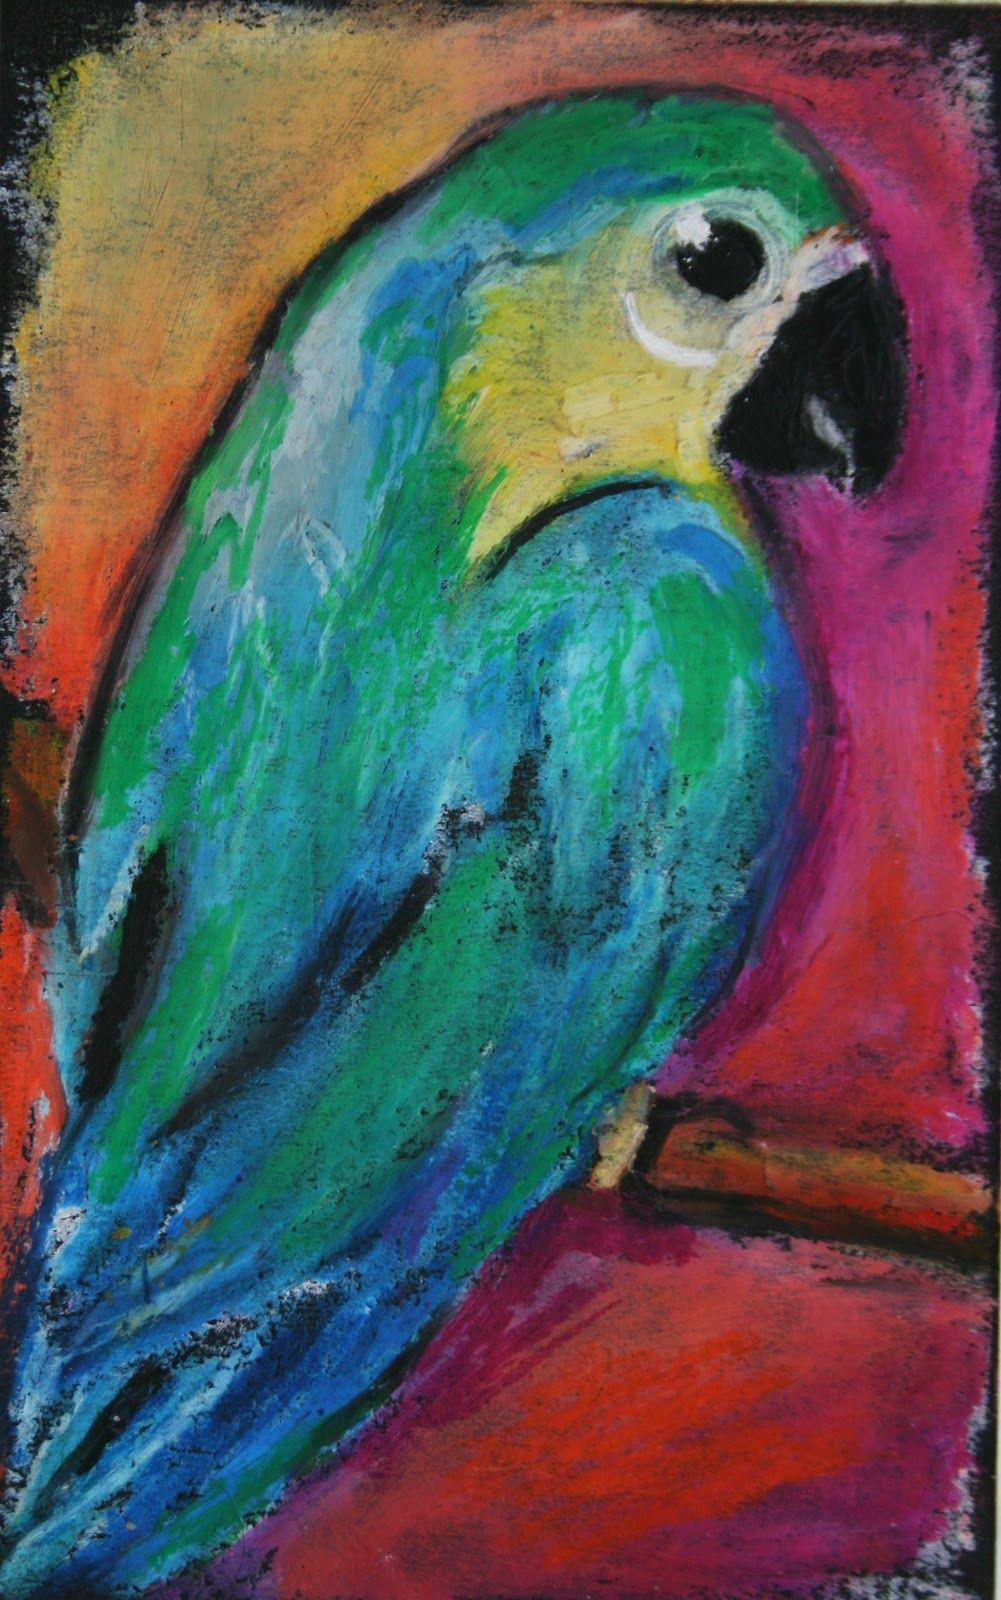 Simple Oil Pastel Art Google Search Oil Pastel Drawings Oil Pastel Art Oil Pastel Paintings